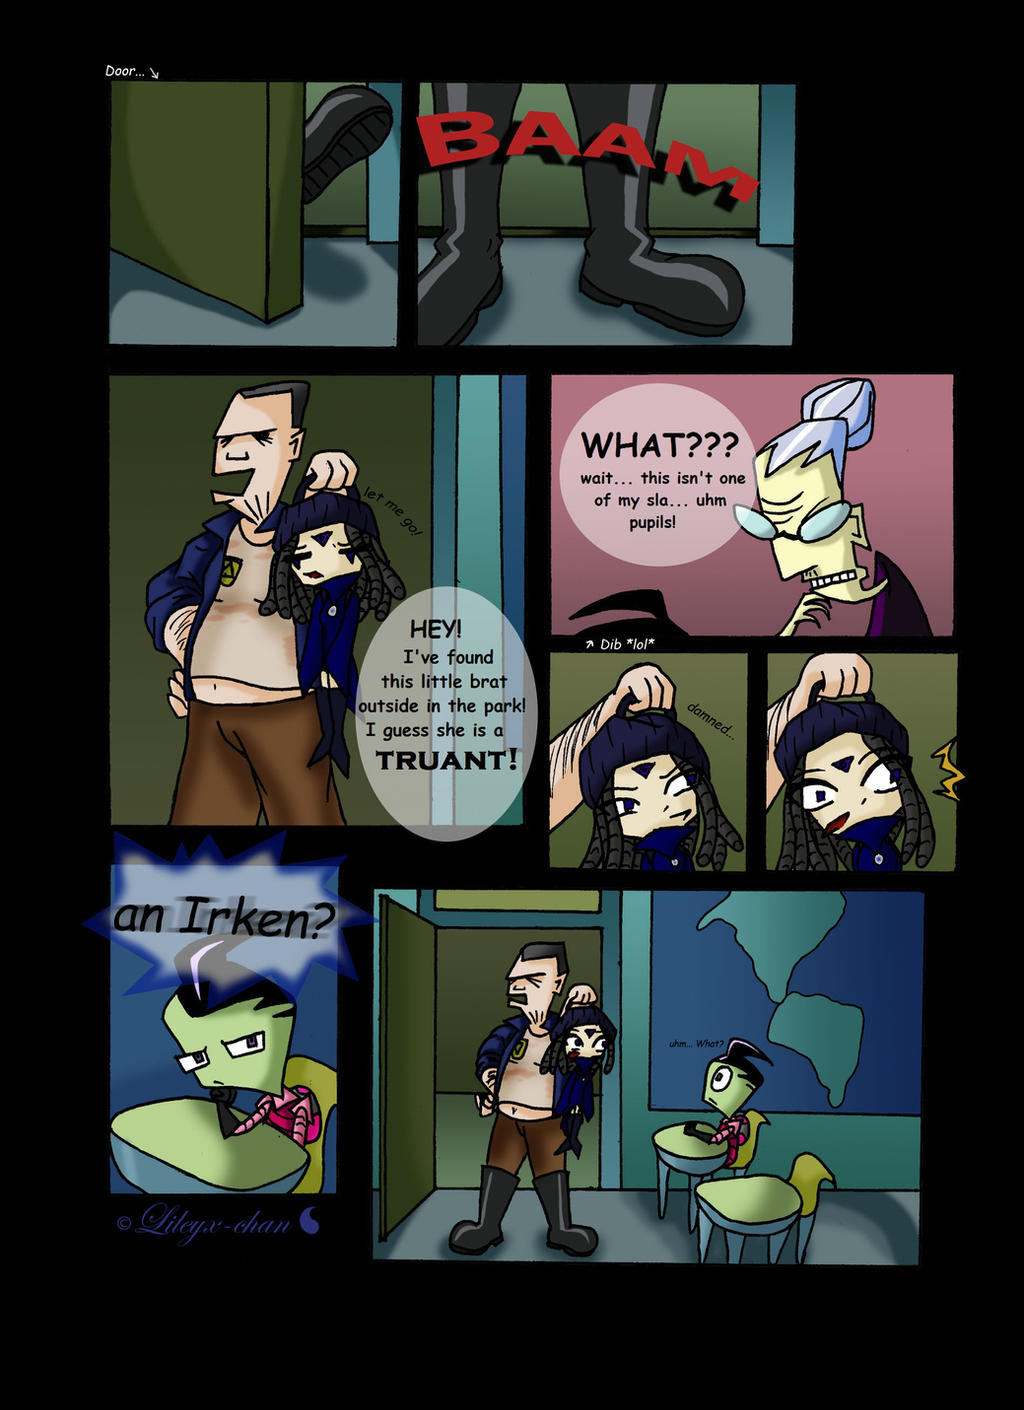 Invader Zim Fan Comics Invader Zim - FanComic...